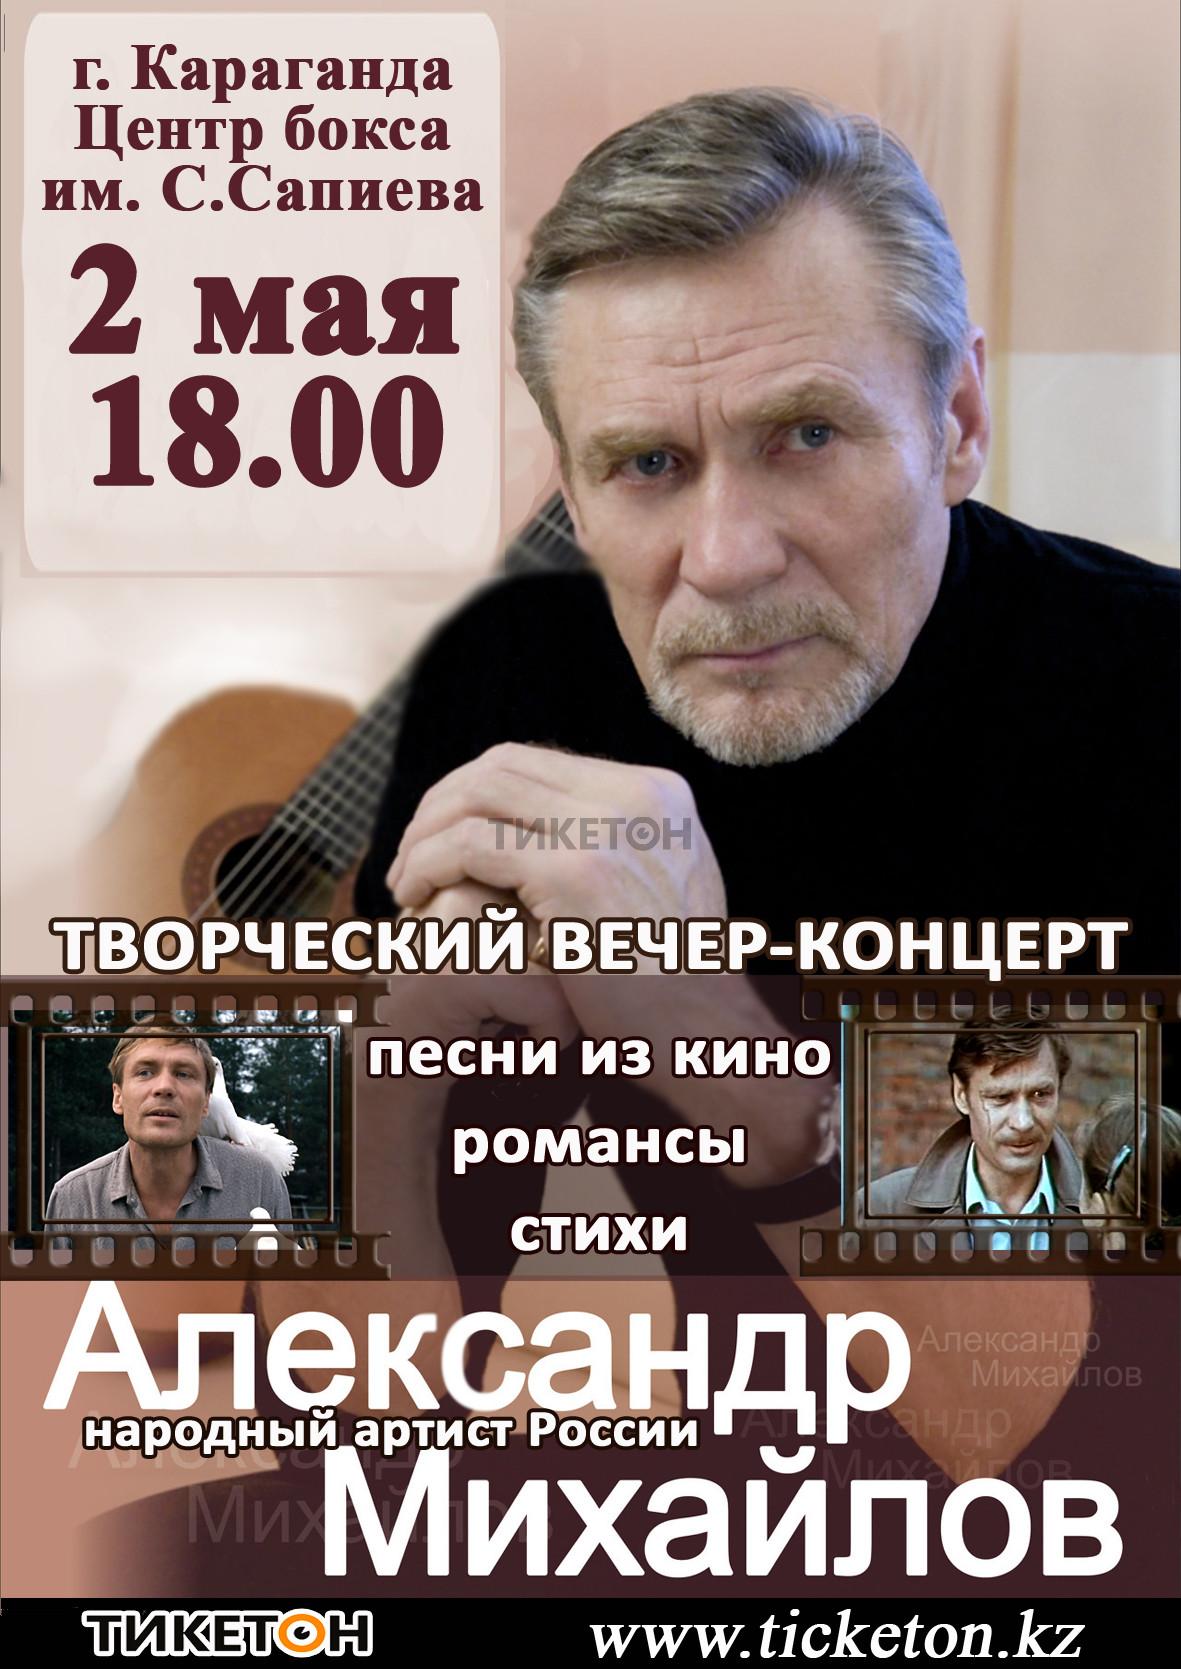 afisha-mikhailov1-11